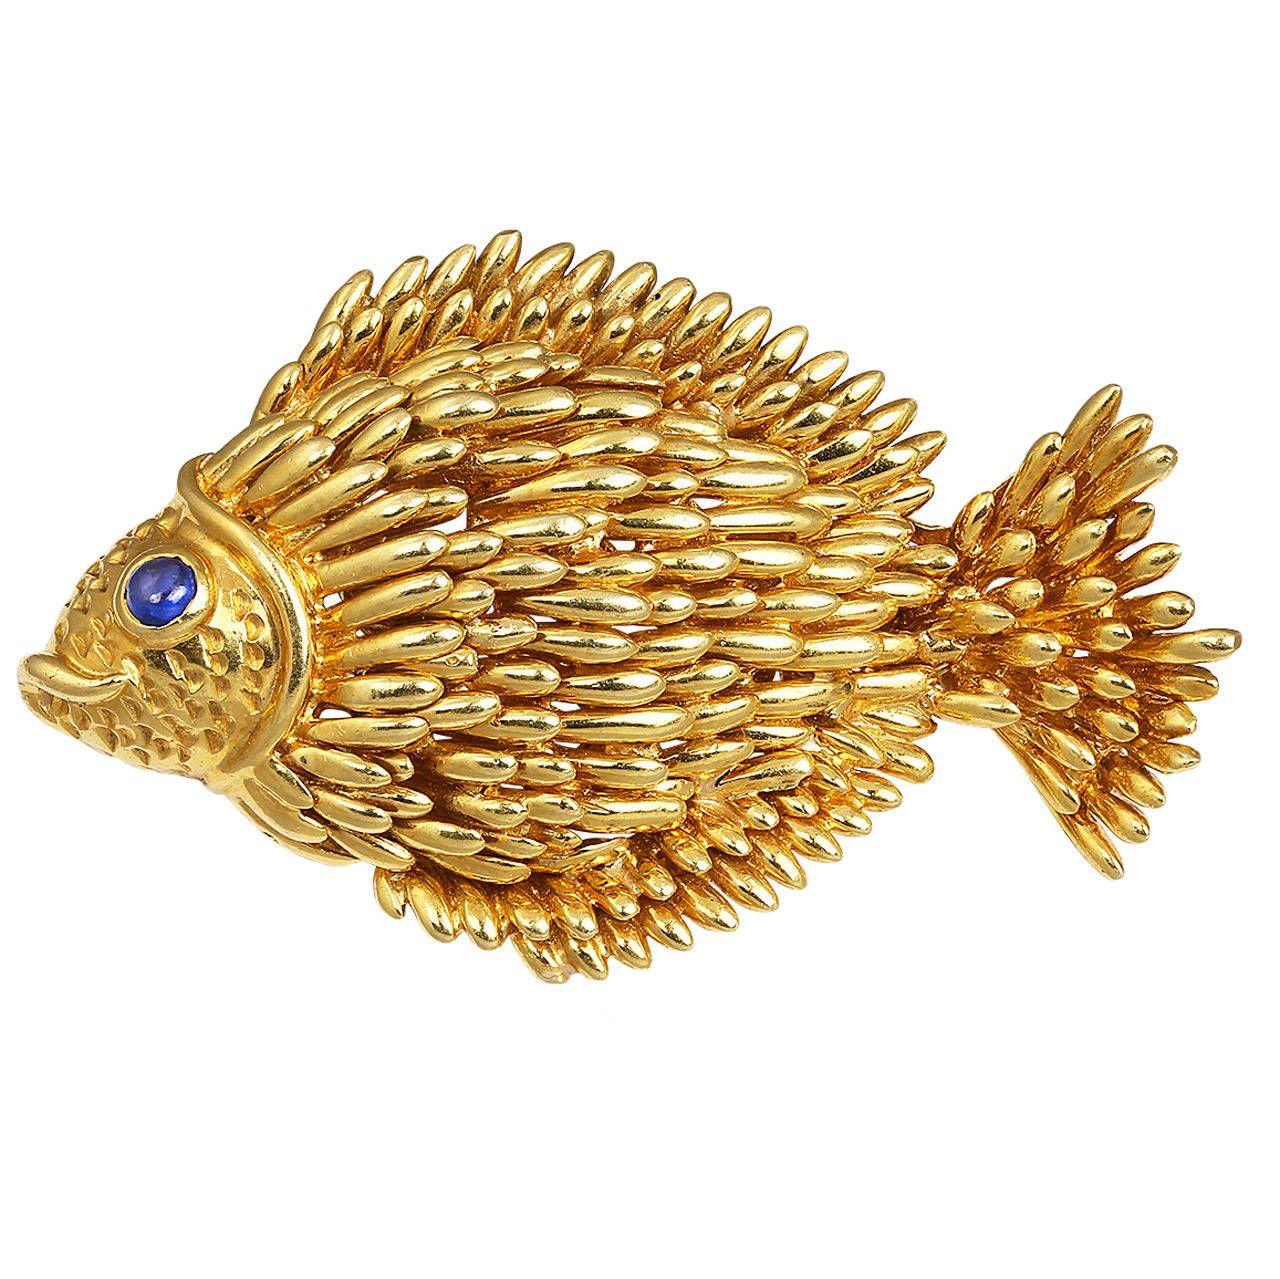 Tiffany & Co. Sapphire Gold Fish Brooch